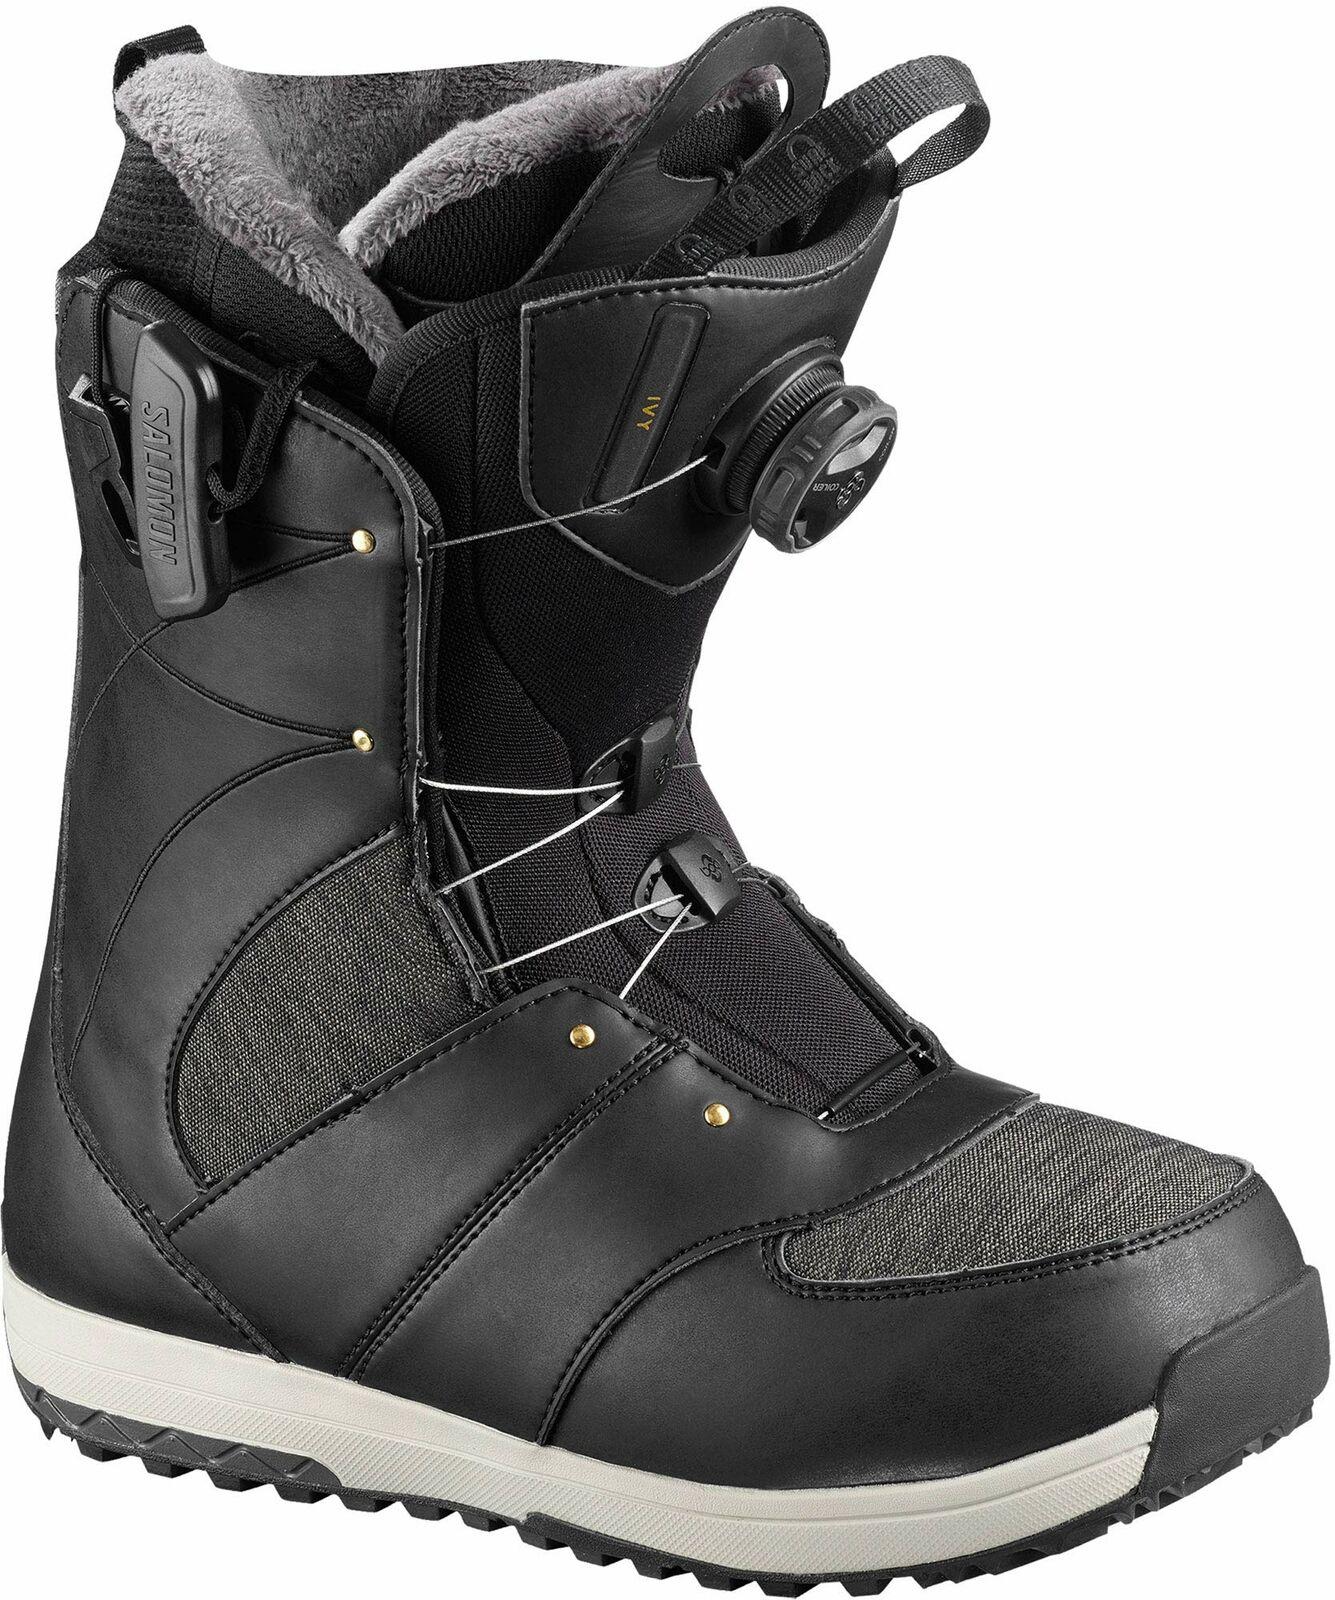 New 2018 Salomon Ivy Boa Snowboard Boots Womens 7.5 Bordeaux